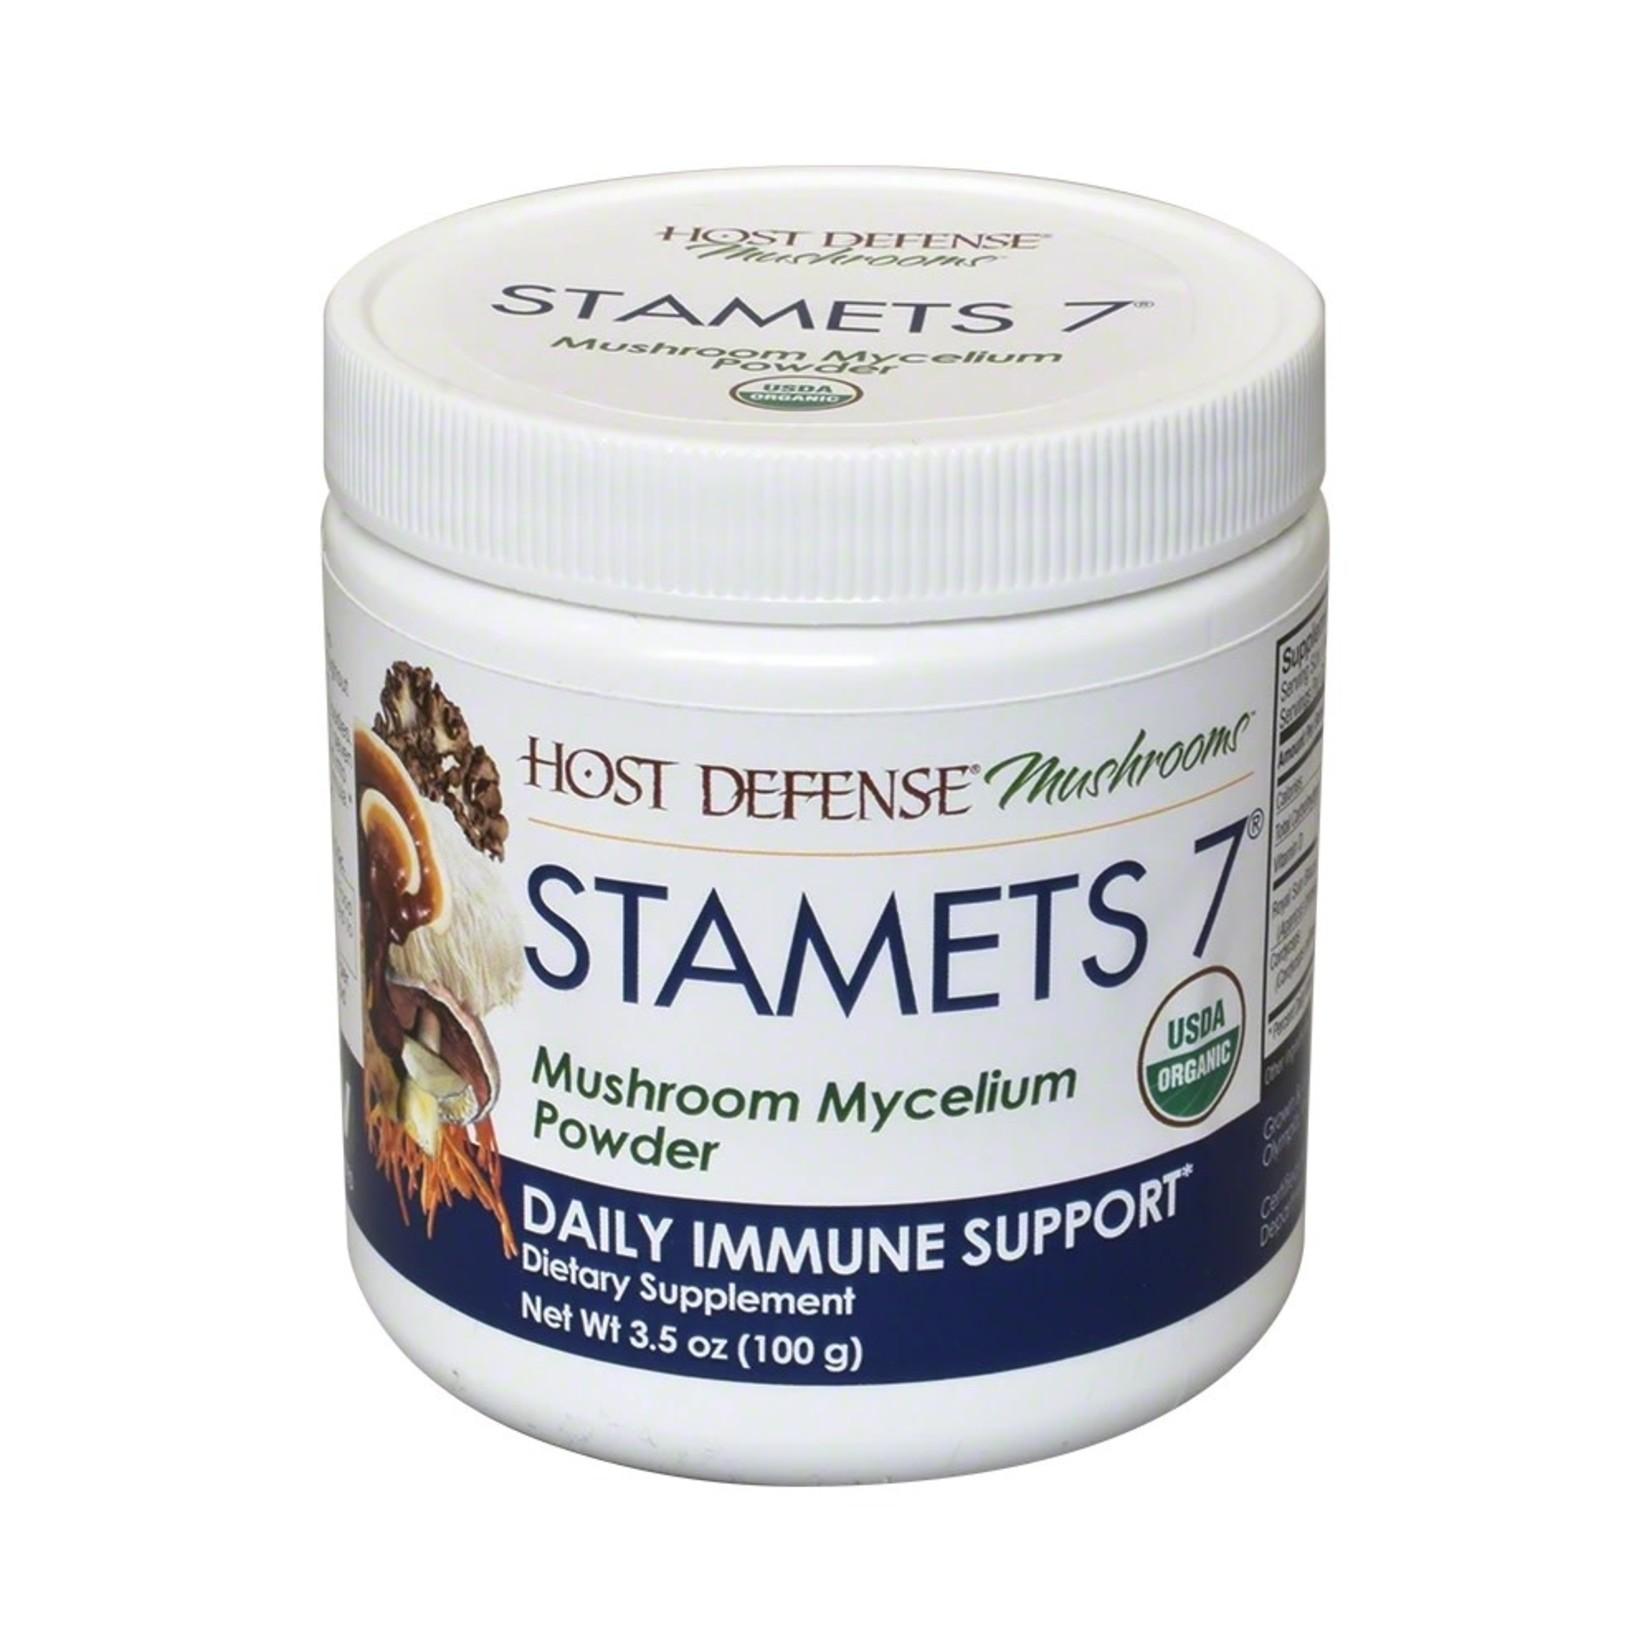 Host Defense HD Stamets 7 Powder 3.5oz